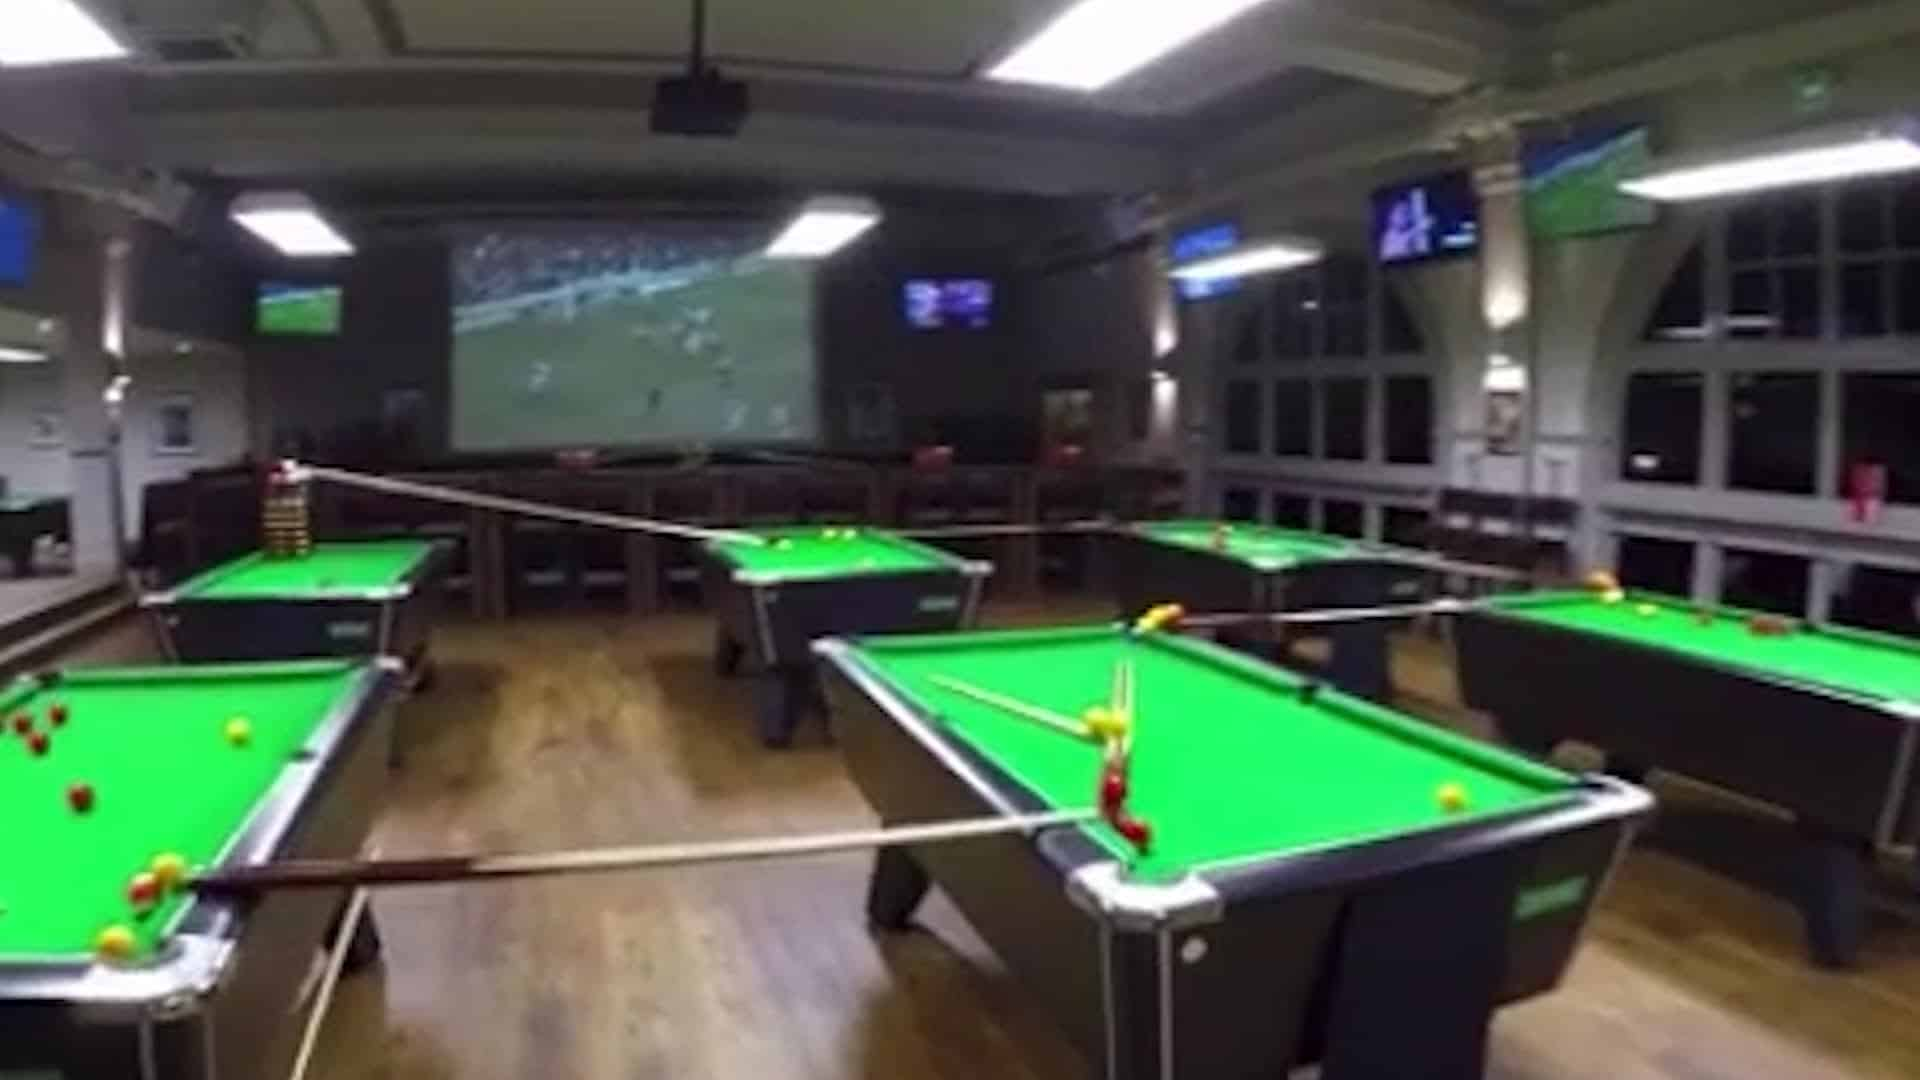 Billiards Trick Shot over dozens of pool tables away | Dravens Tales